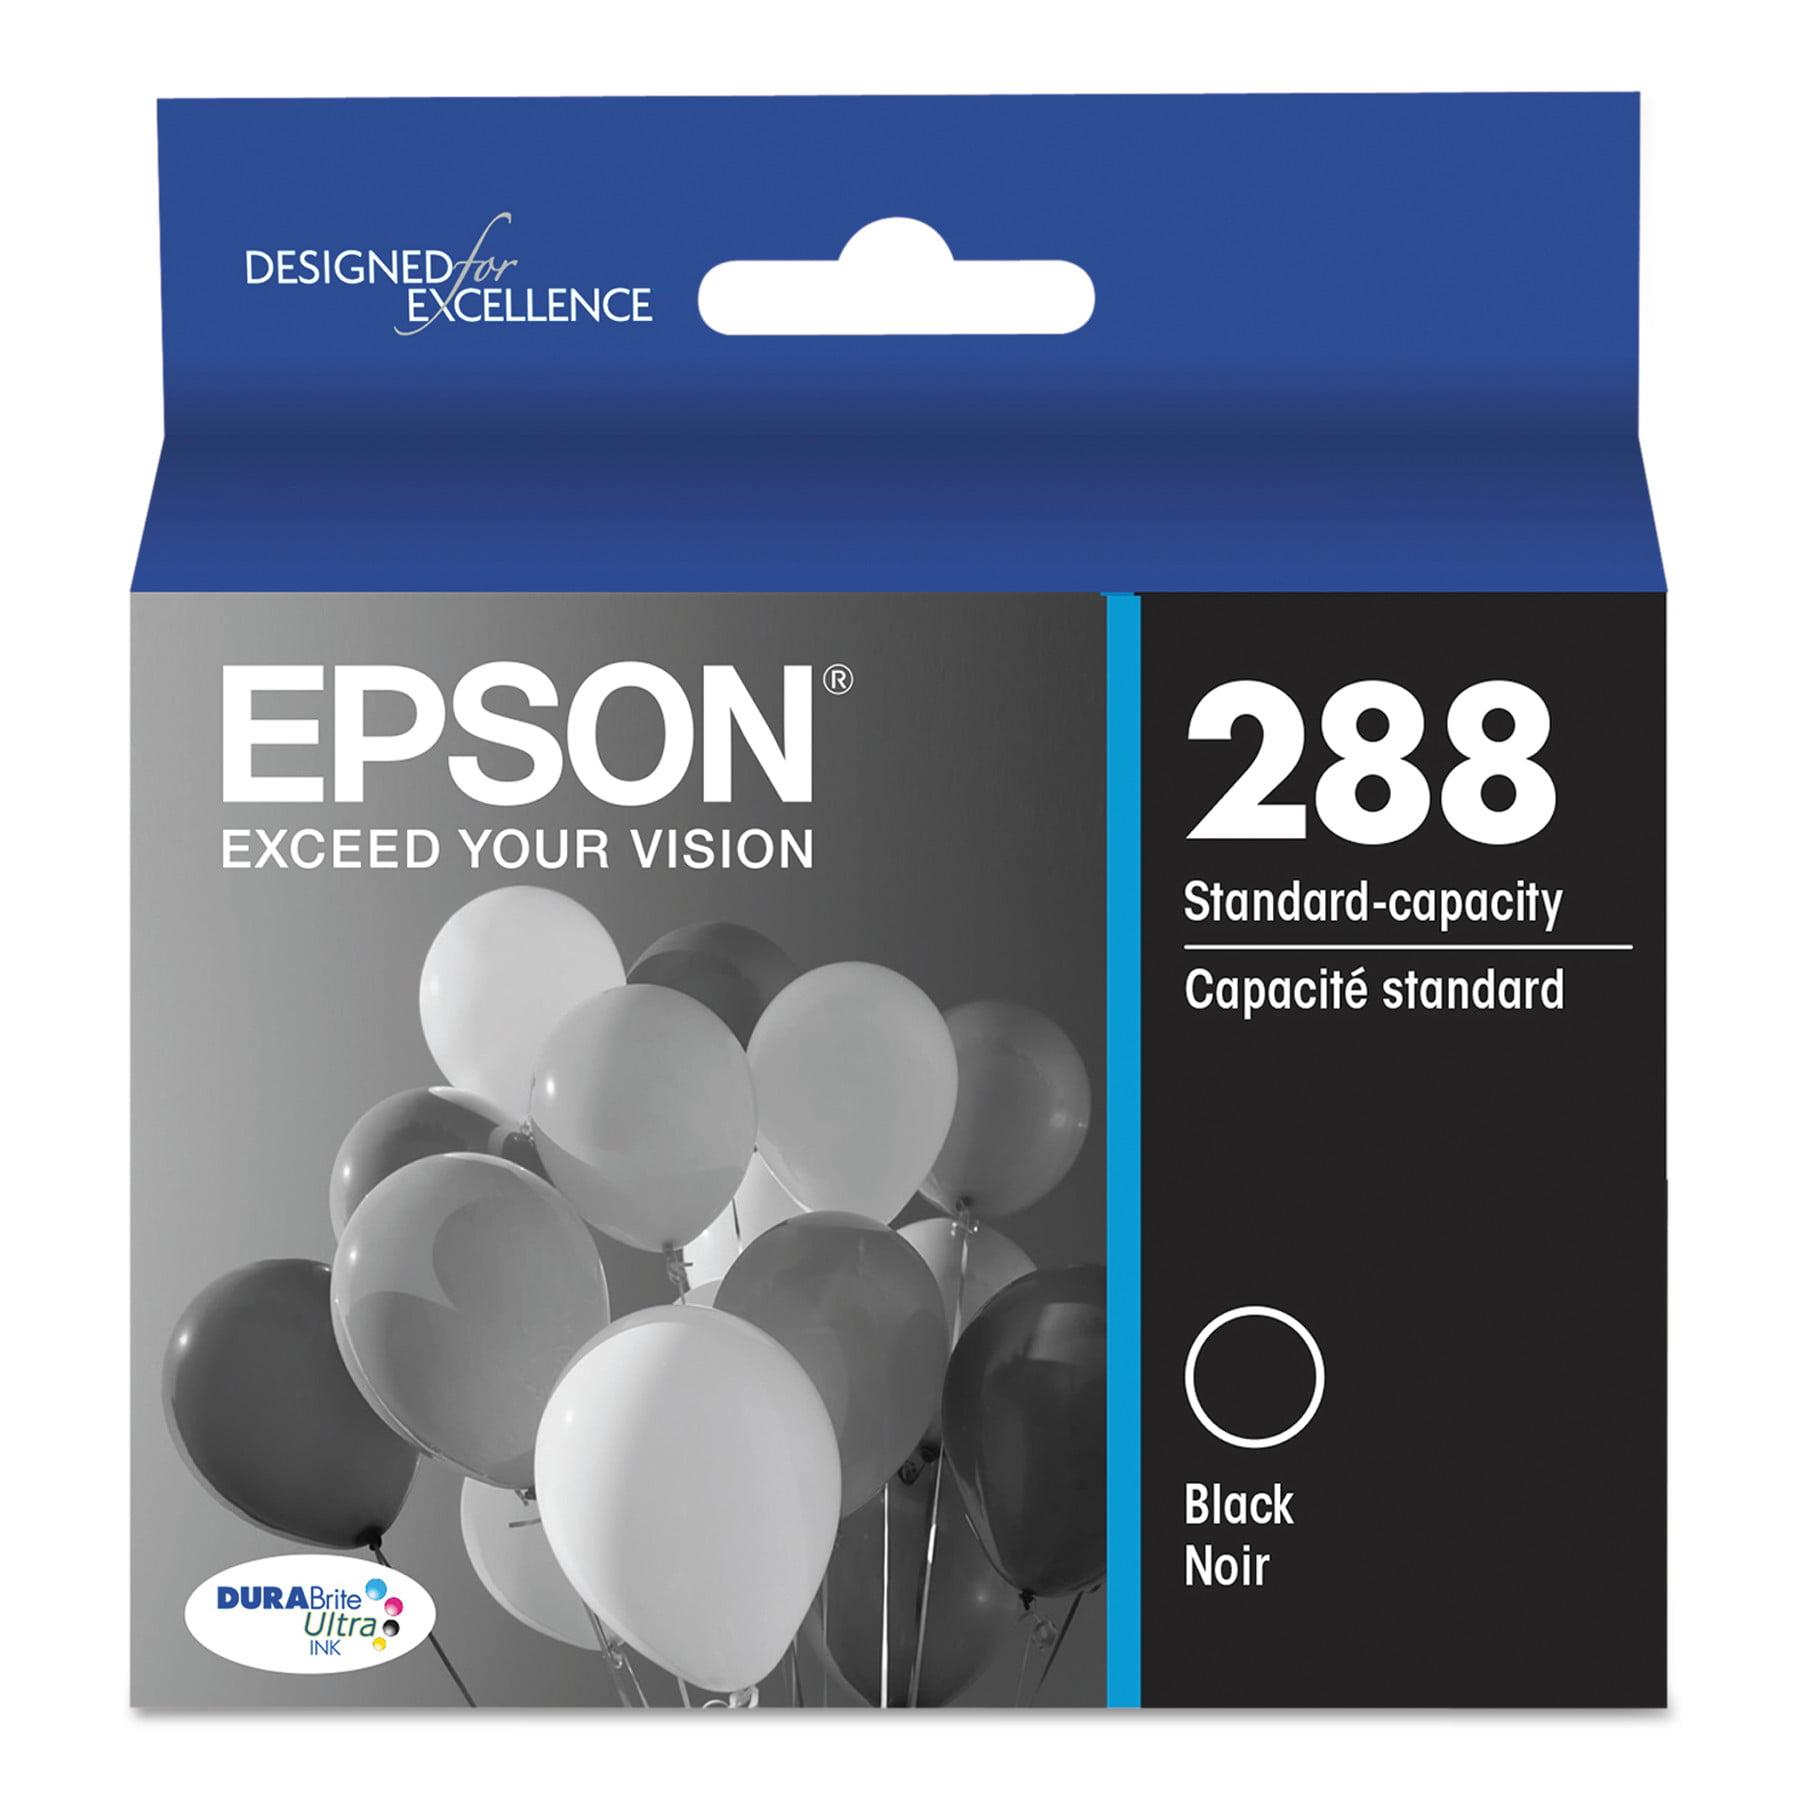 Epson 288 DURABrite Ultra Inks, Standard-Yield, Black - Walmart.com